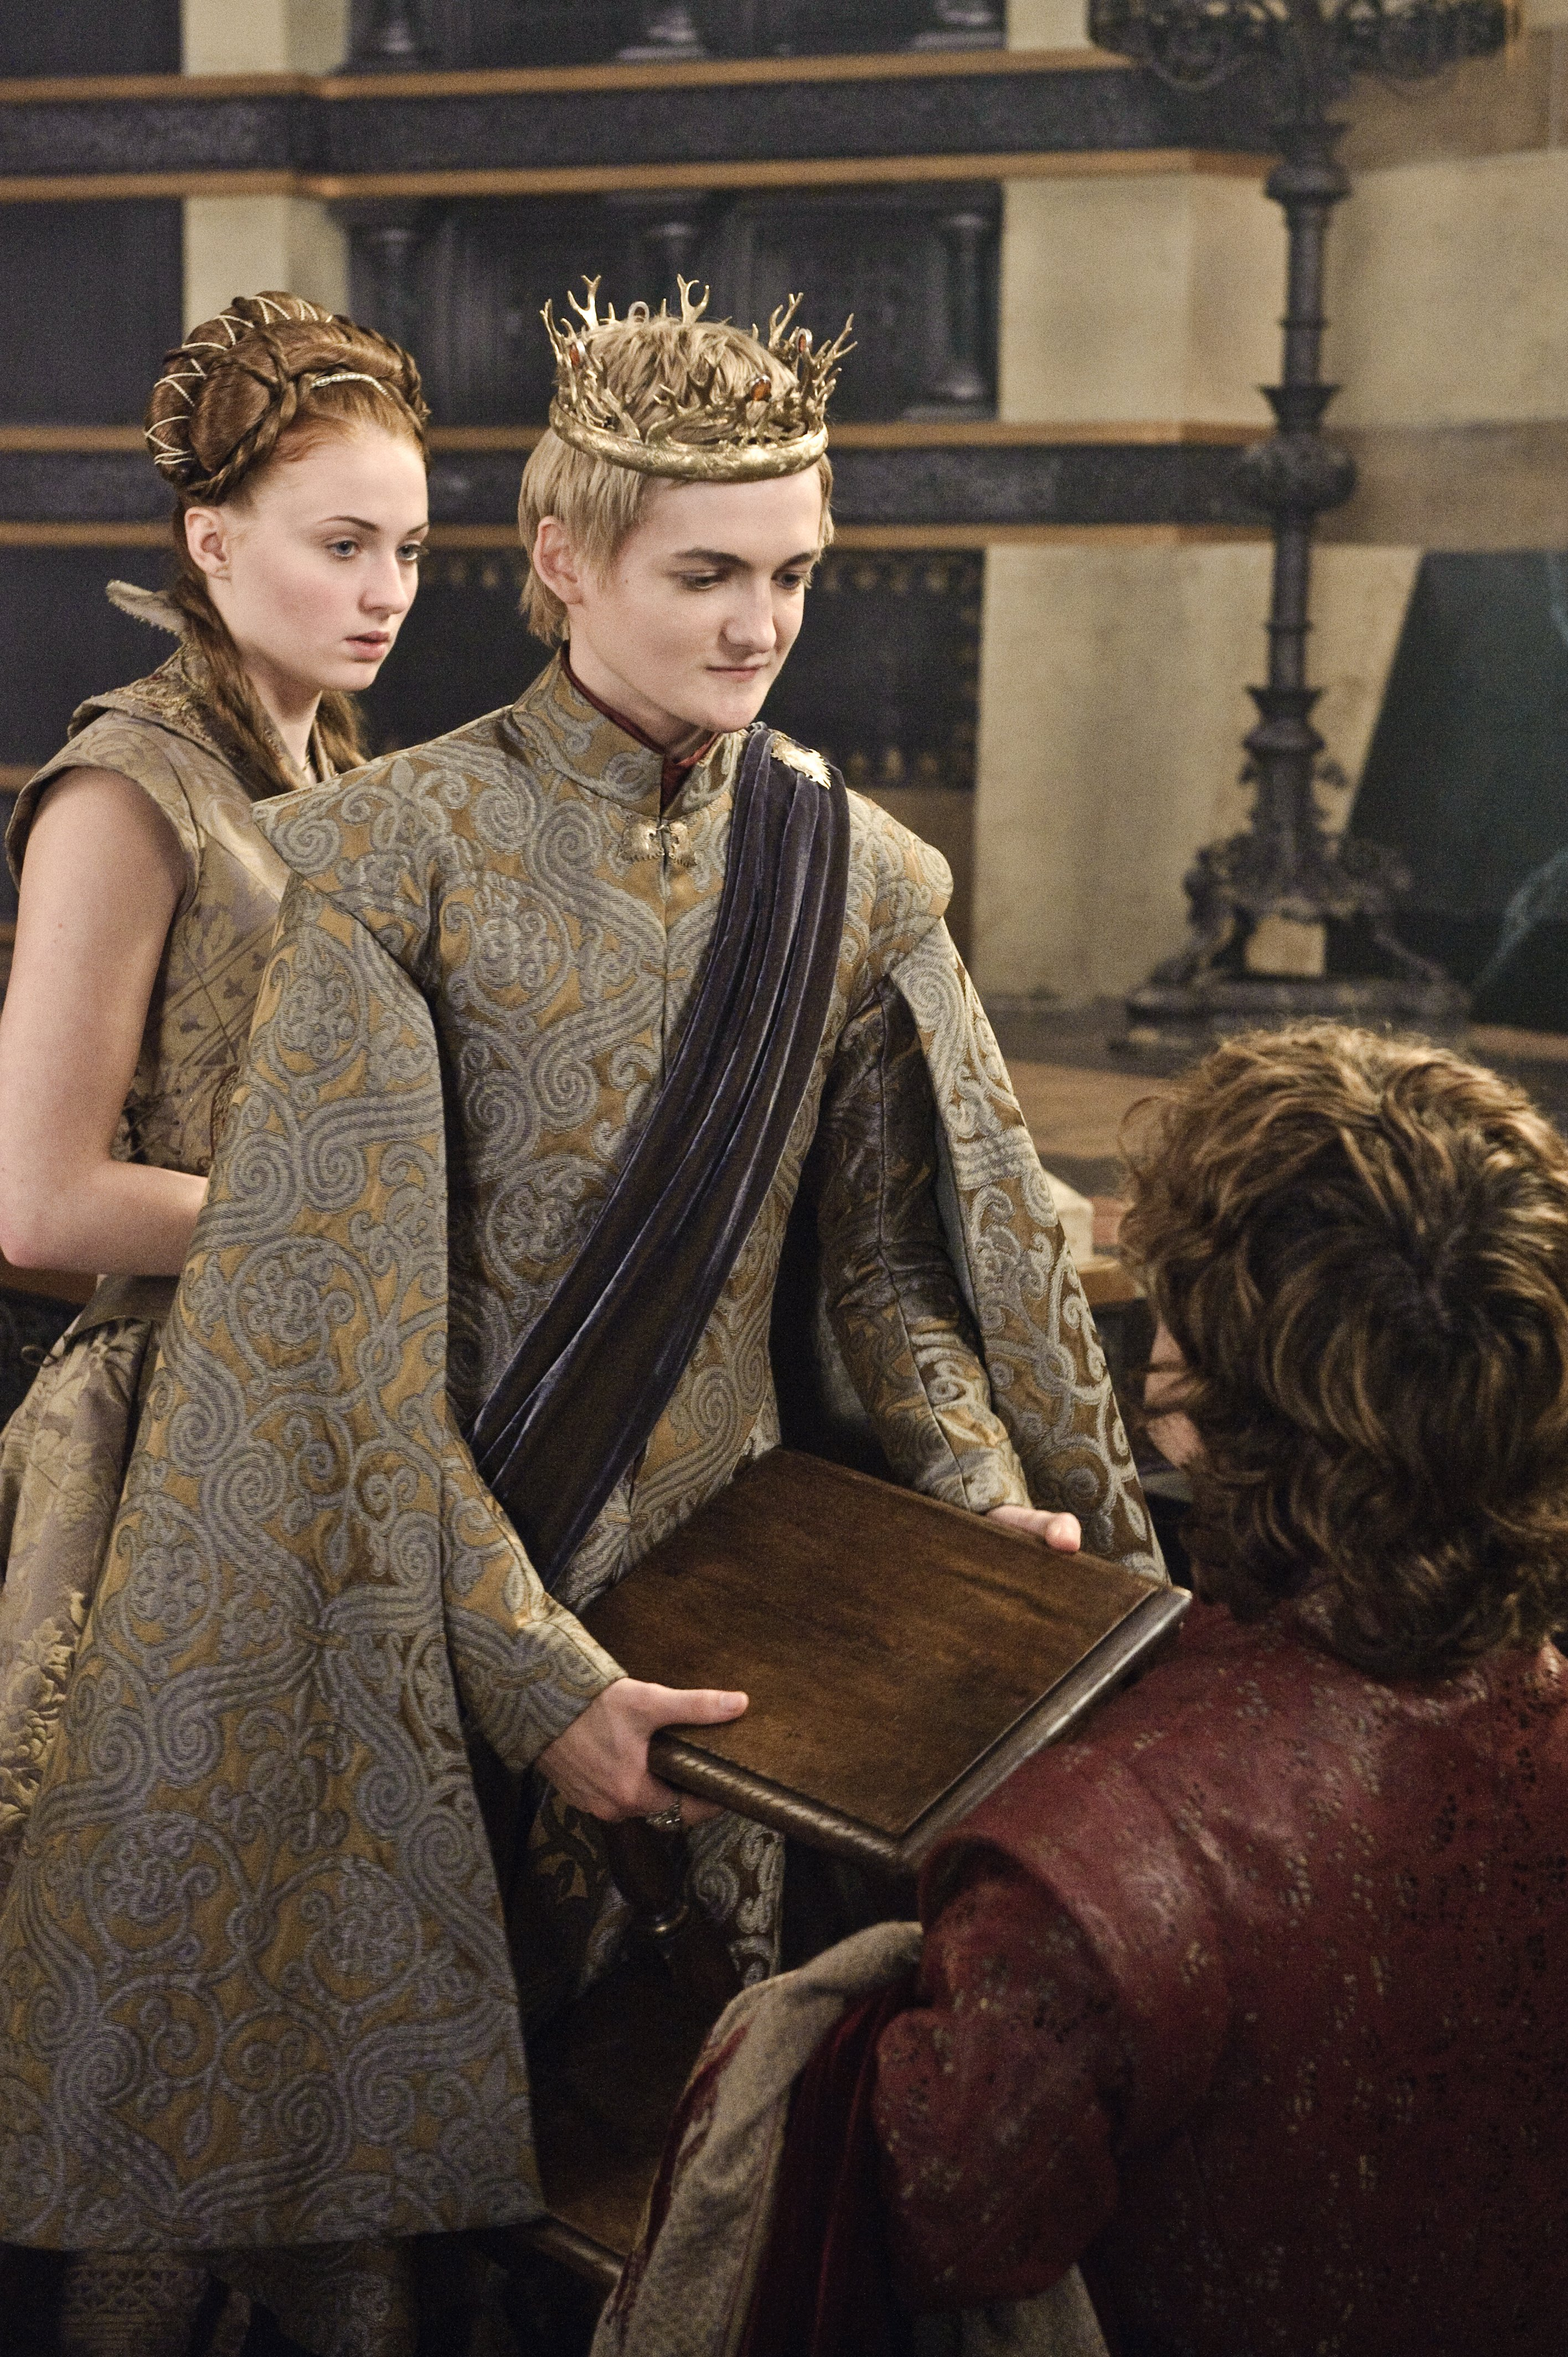 Sansa Stark, Tyrion Lannister & Joffrey Baratheon